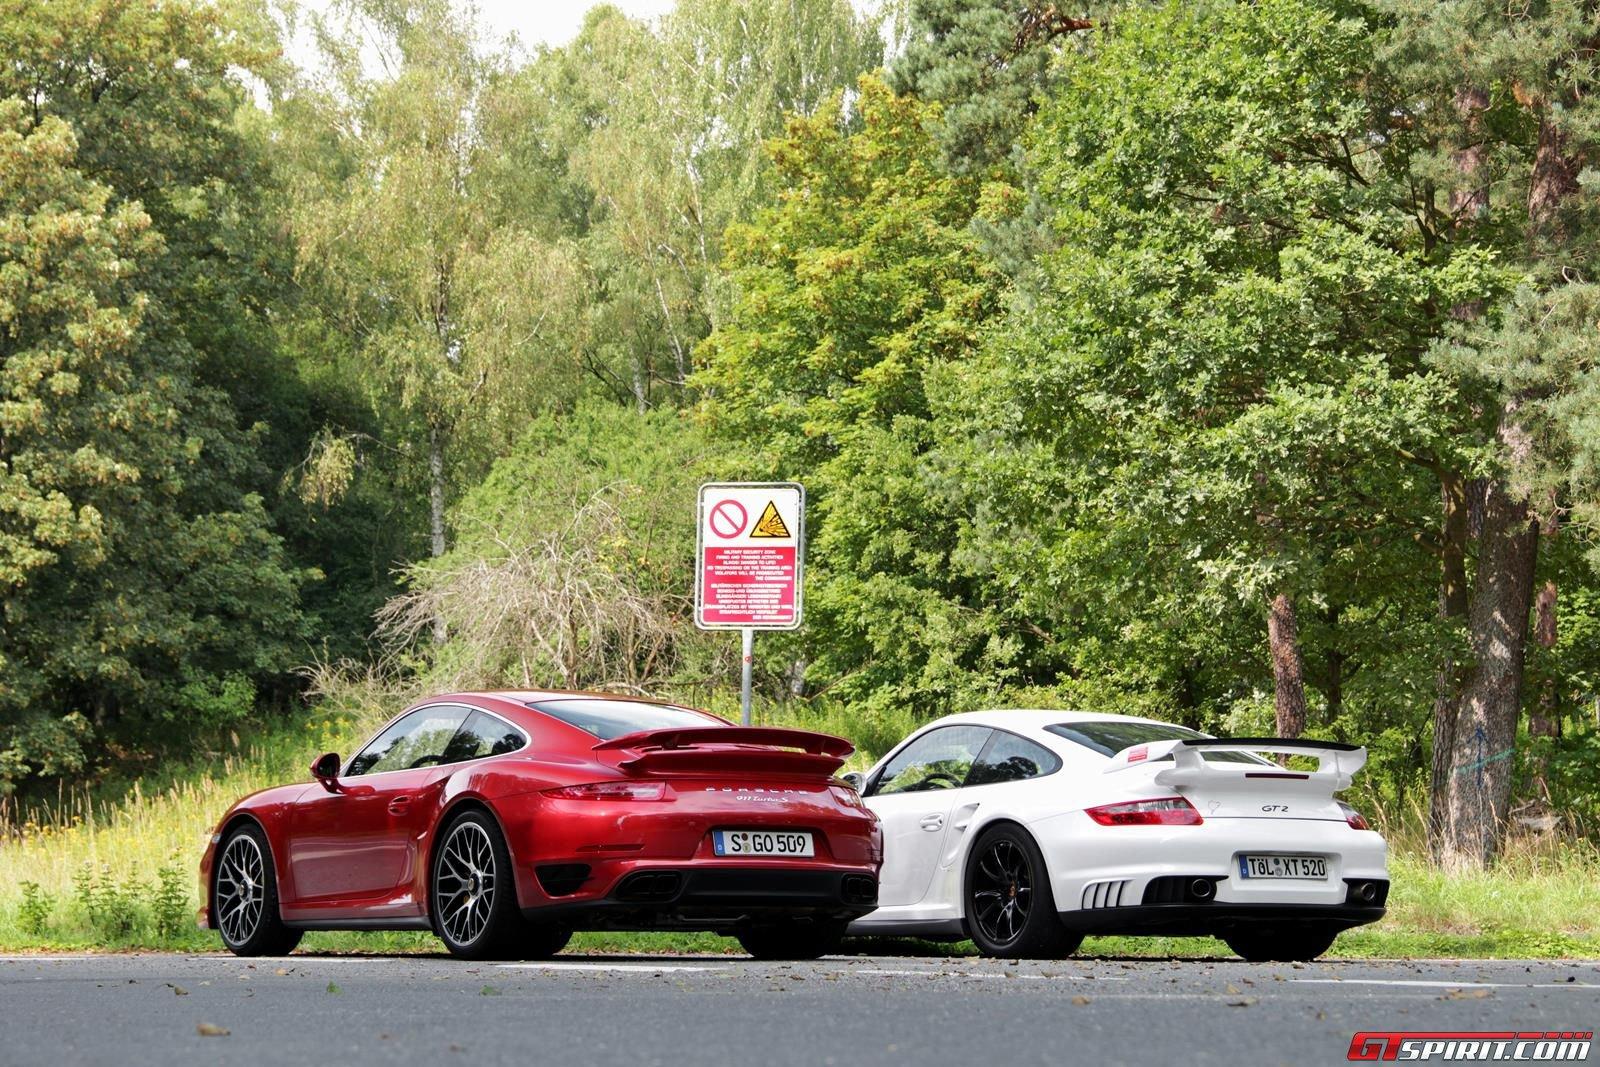 Road Test: 2014 Porsche 991 Turbo & Turbo S Review on porsche turbo s, porsche convertible, porsche 550 wing, porsche gt3, porsche hre p101 wheels, porsche gemballa, porsche 4 door, porsche cayenne, porsche sapphire blue wallpaper,